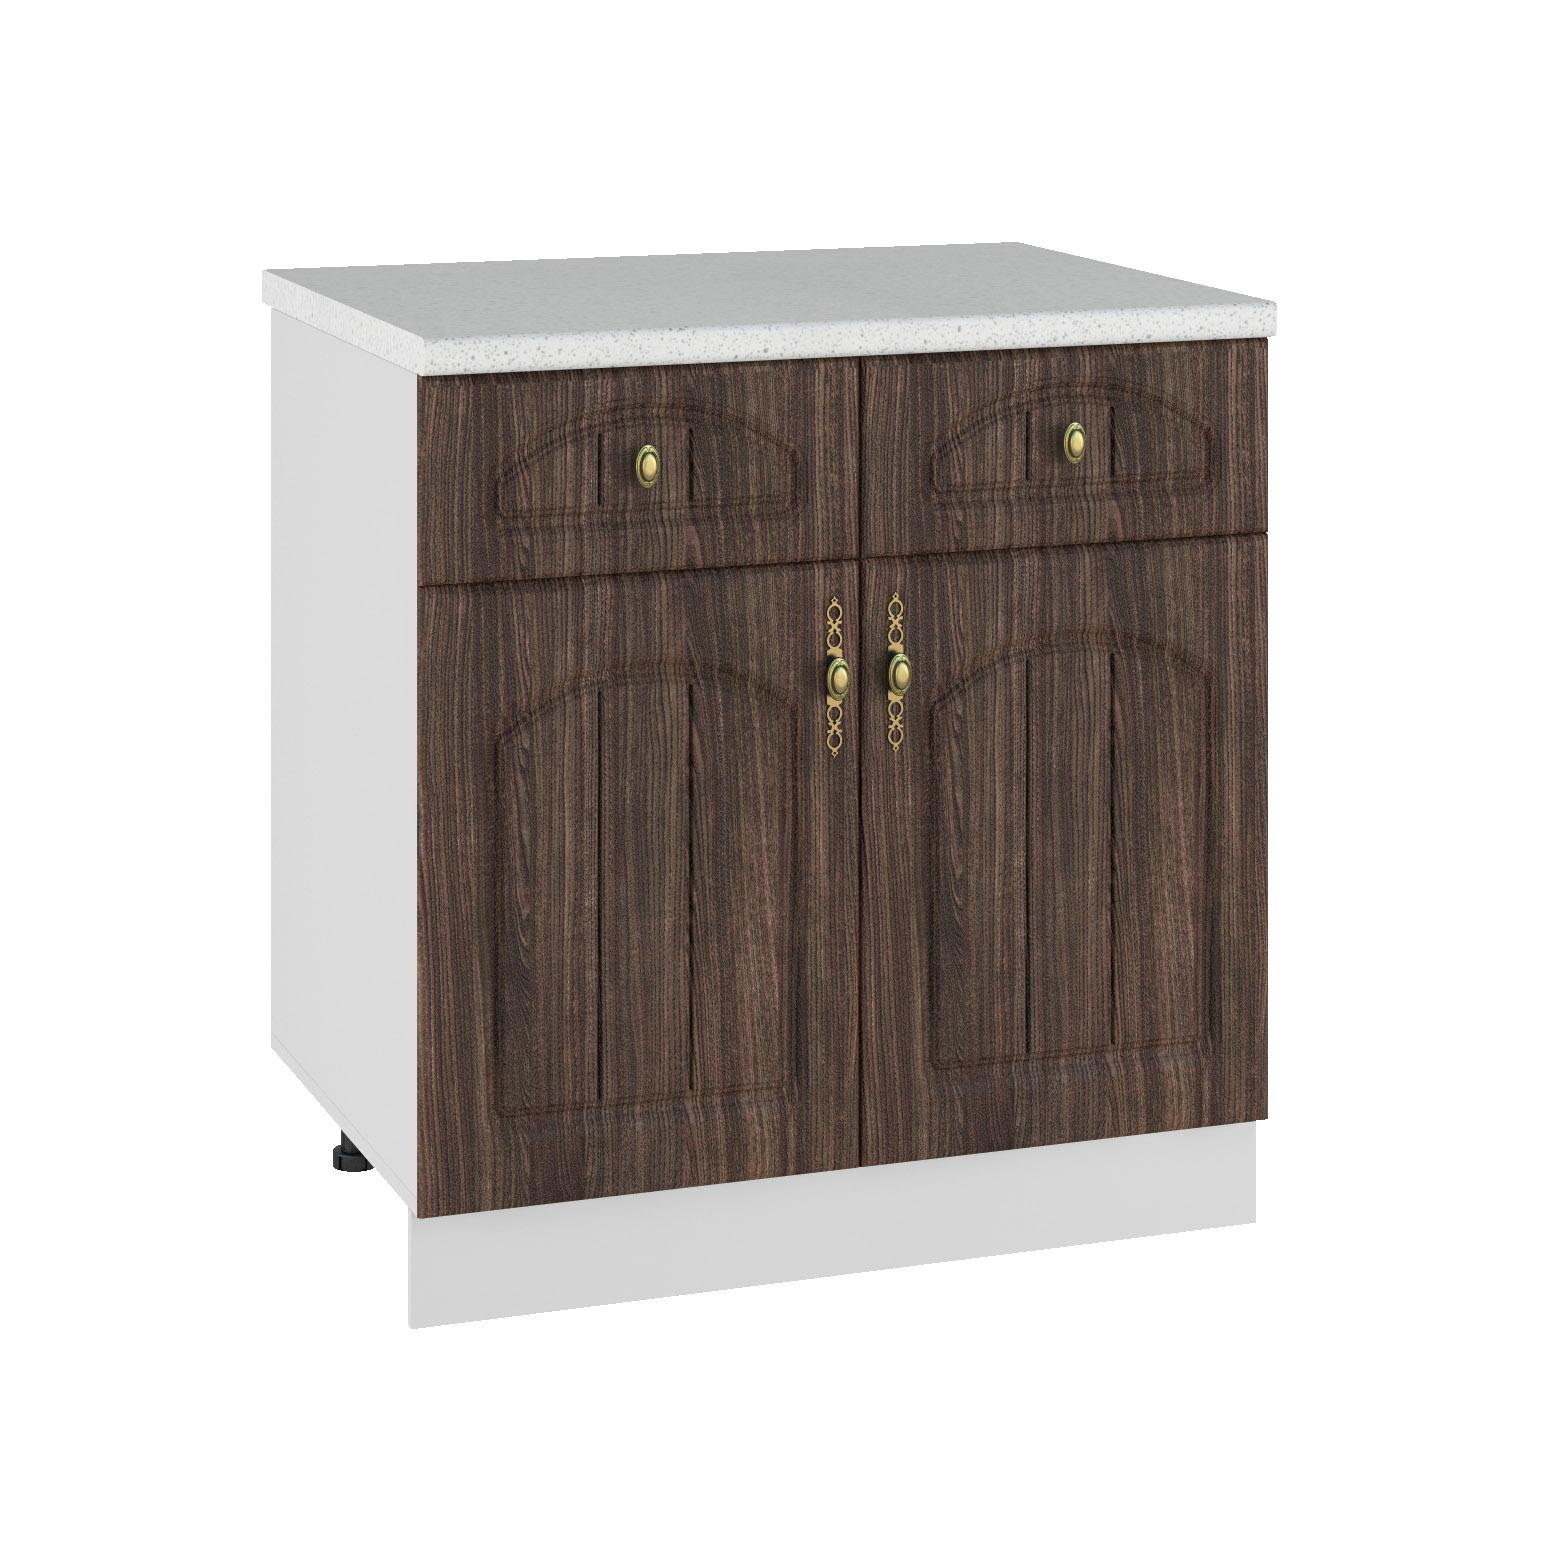 Кухня Монако С2Я 600 Шкаф нижний /2 ящика